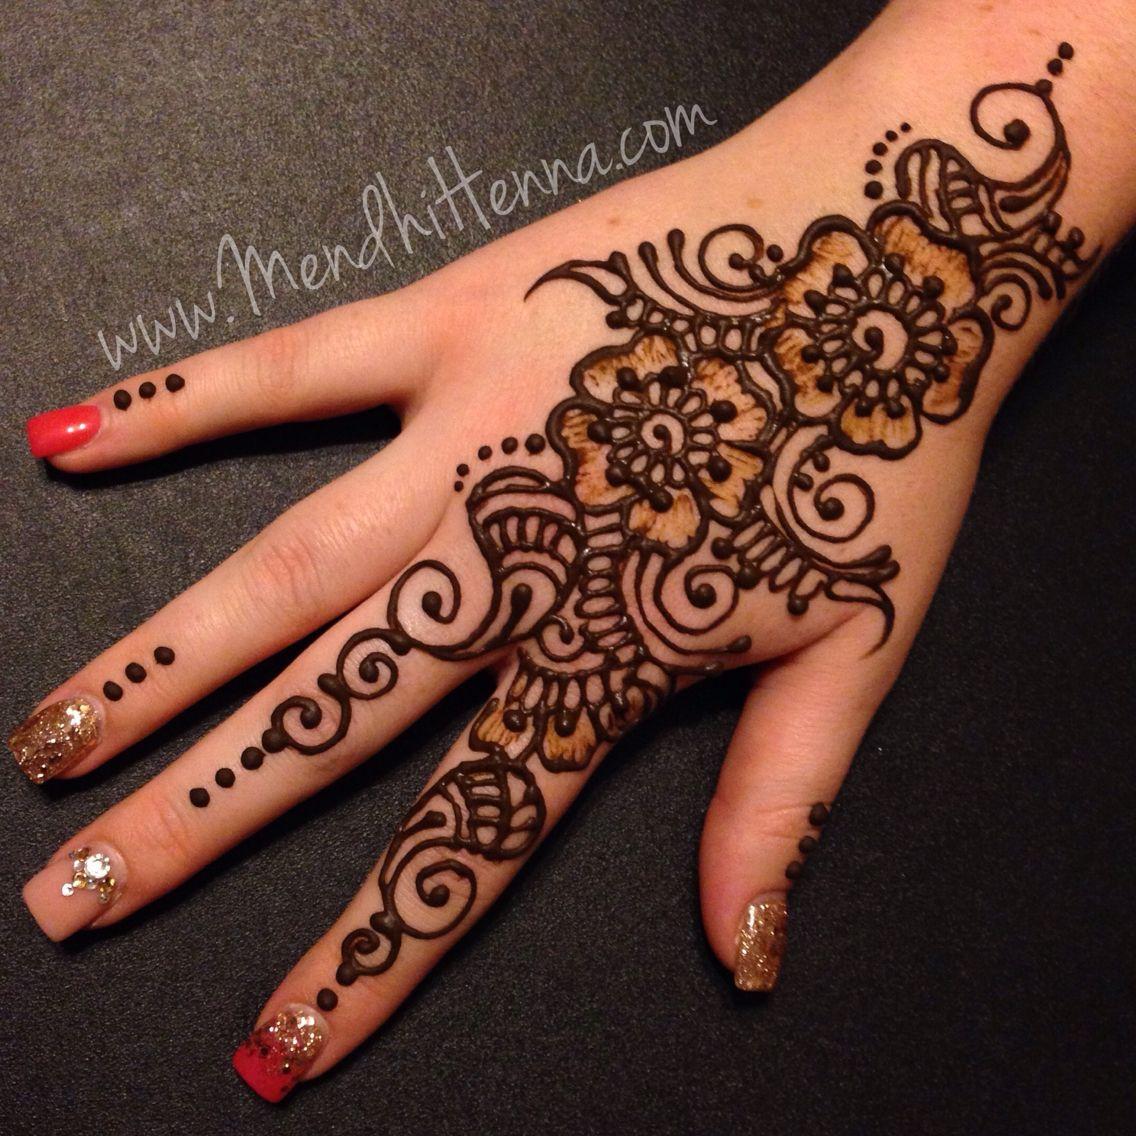 Pin de Crystal Hendrix en Henna designs | Pinterest | Traje